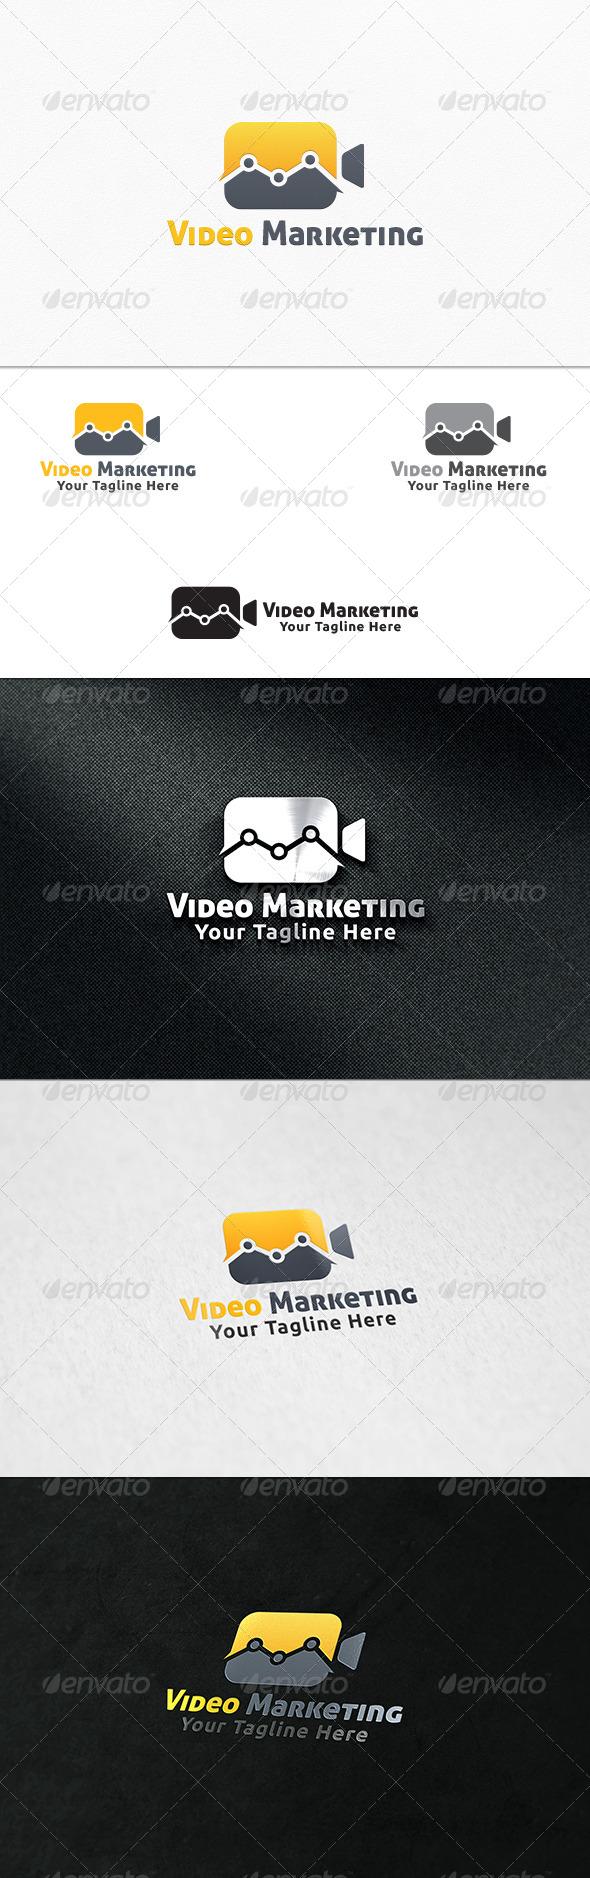 Video Marketing - Logo Template